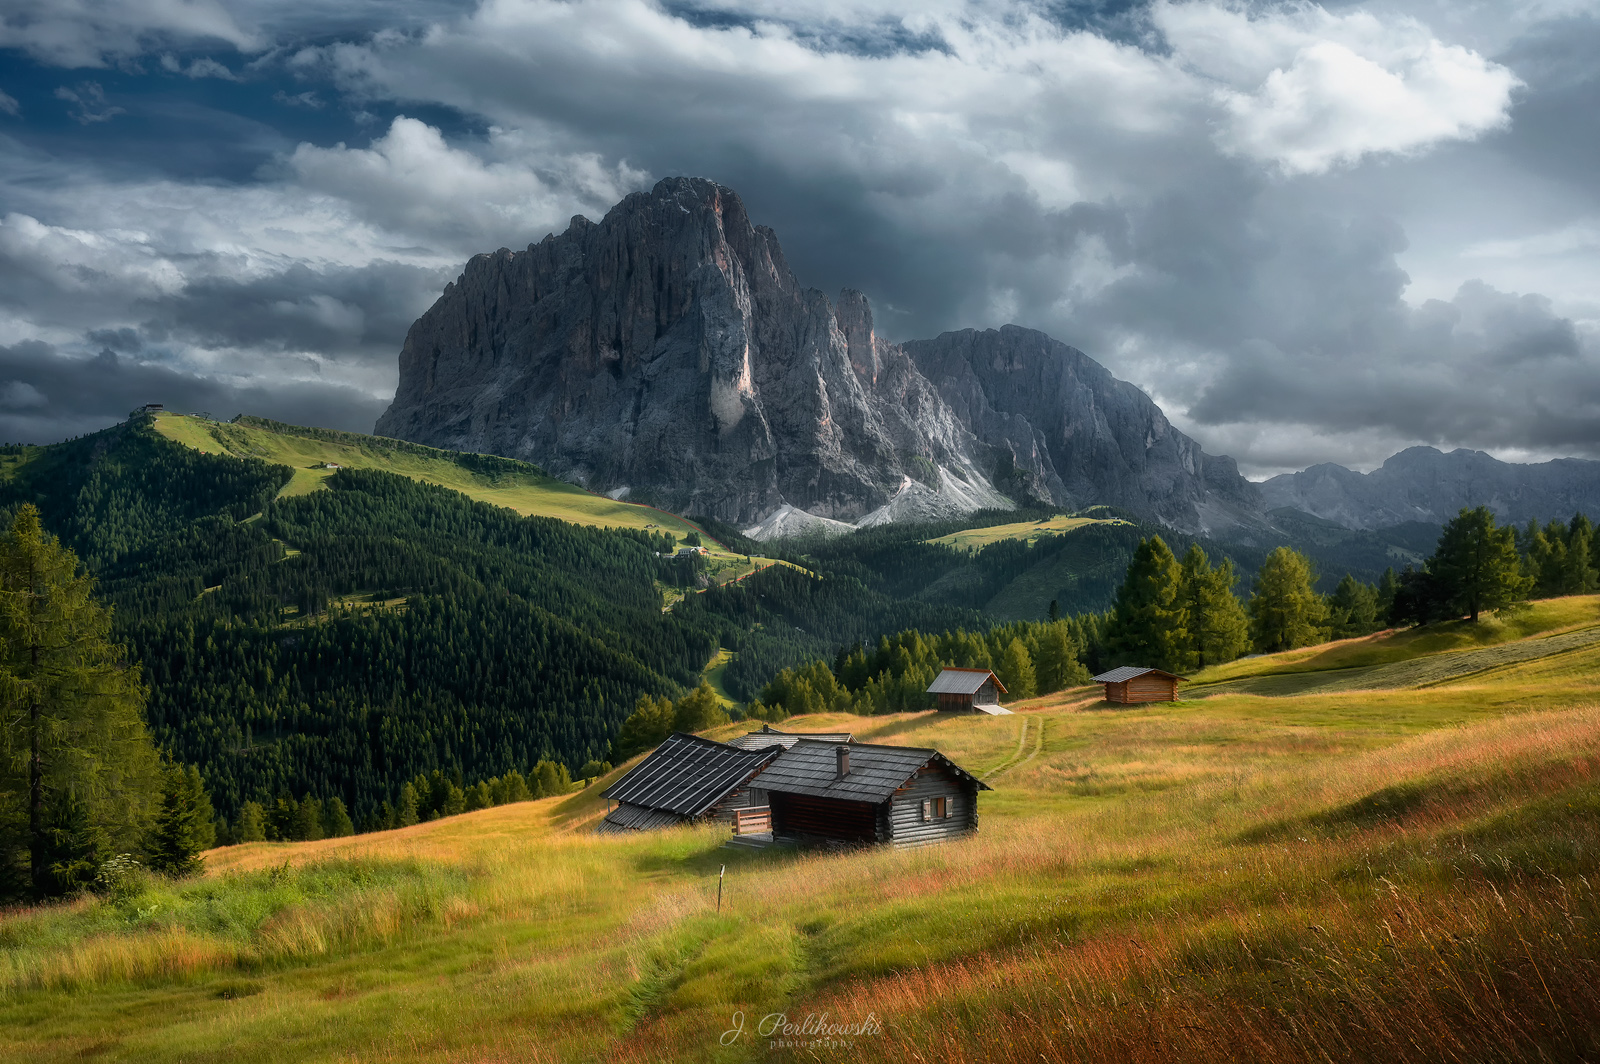 alps, mountains,roam, Perlikowski Jakub